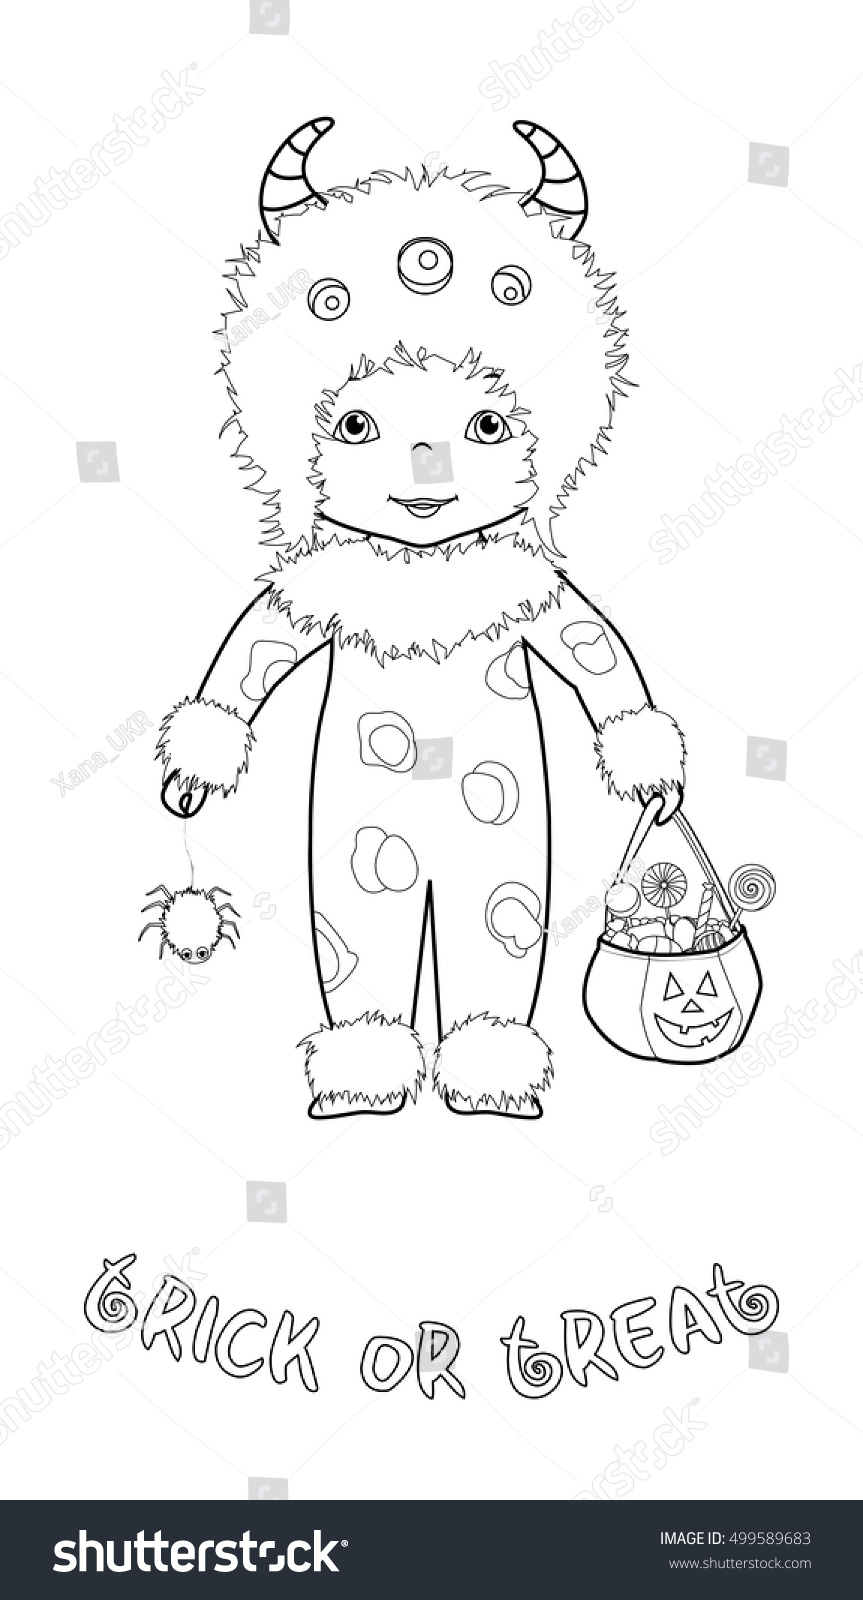 Trick Treat Halloween Cartoon Coloring Page Stock Vector (Royalty ...